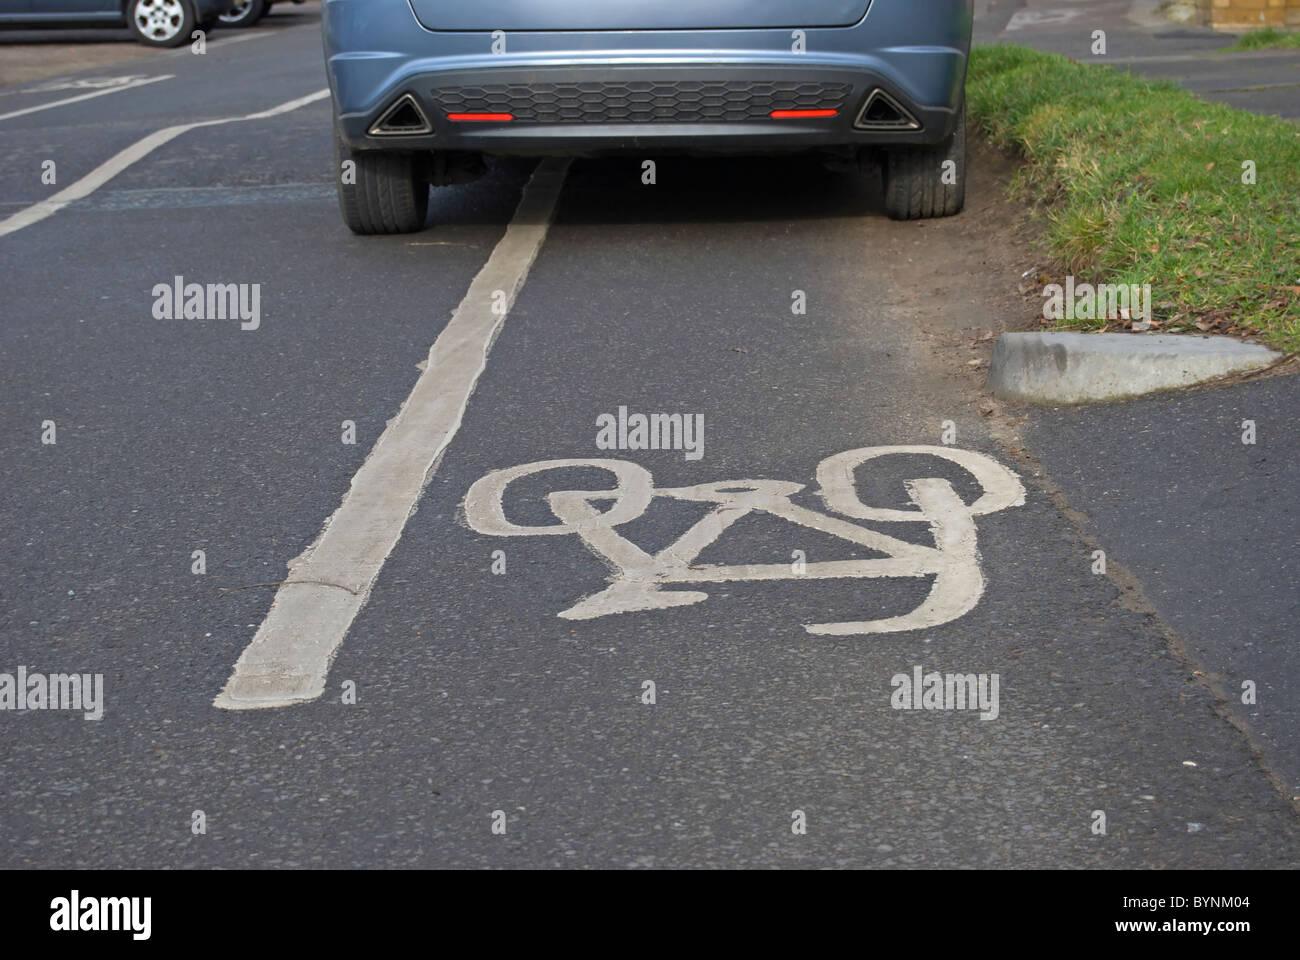 car parked in mandatory cycle lane, in ham, surrey, englandStock Photo